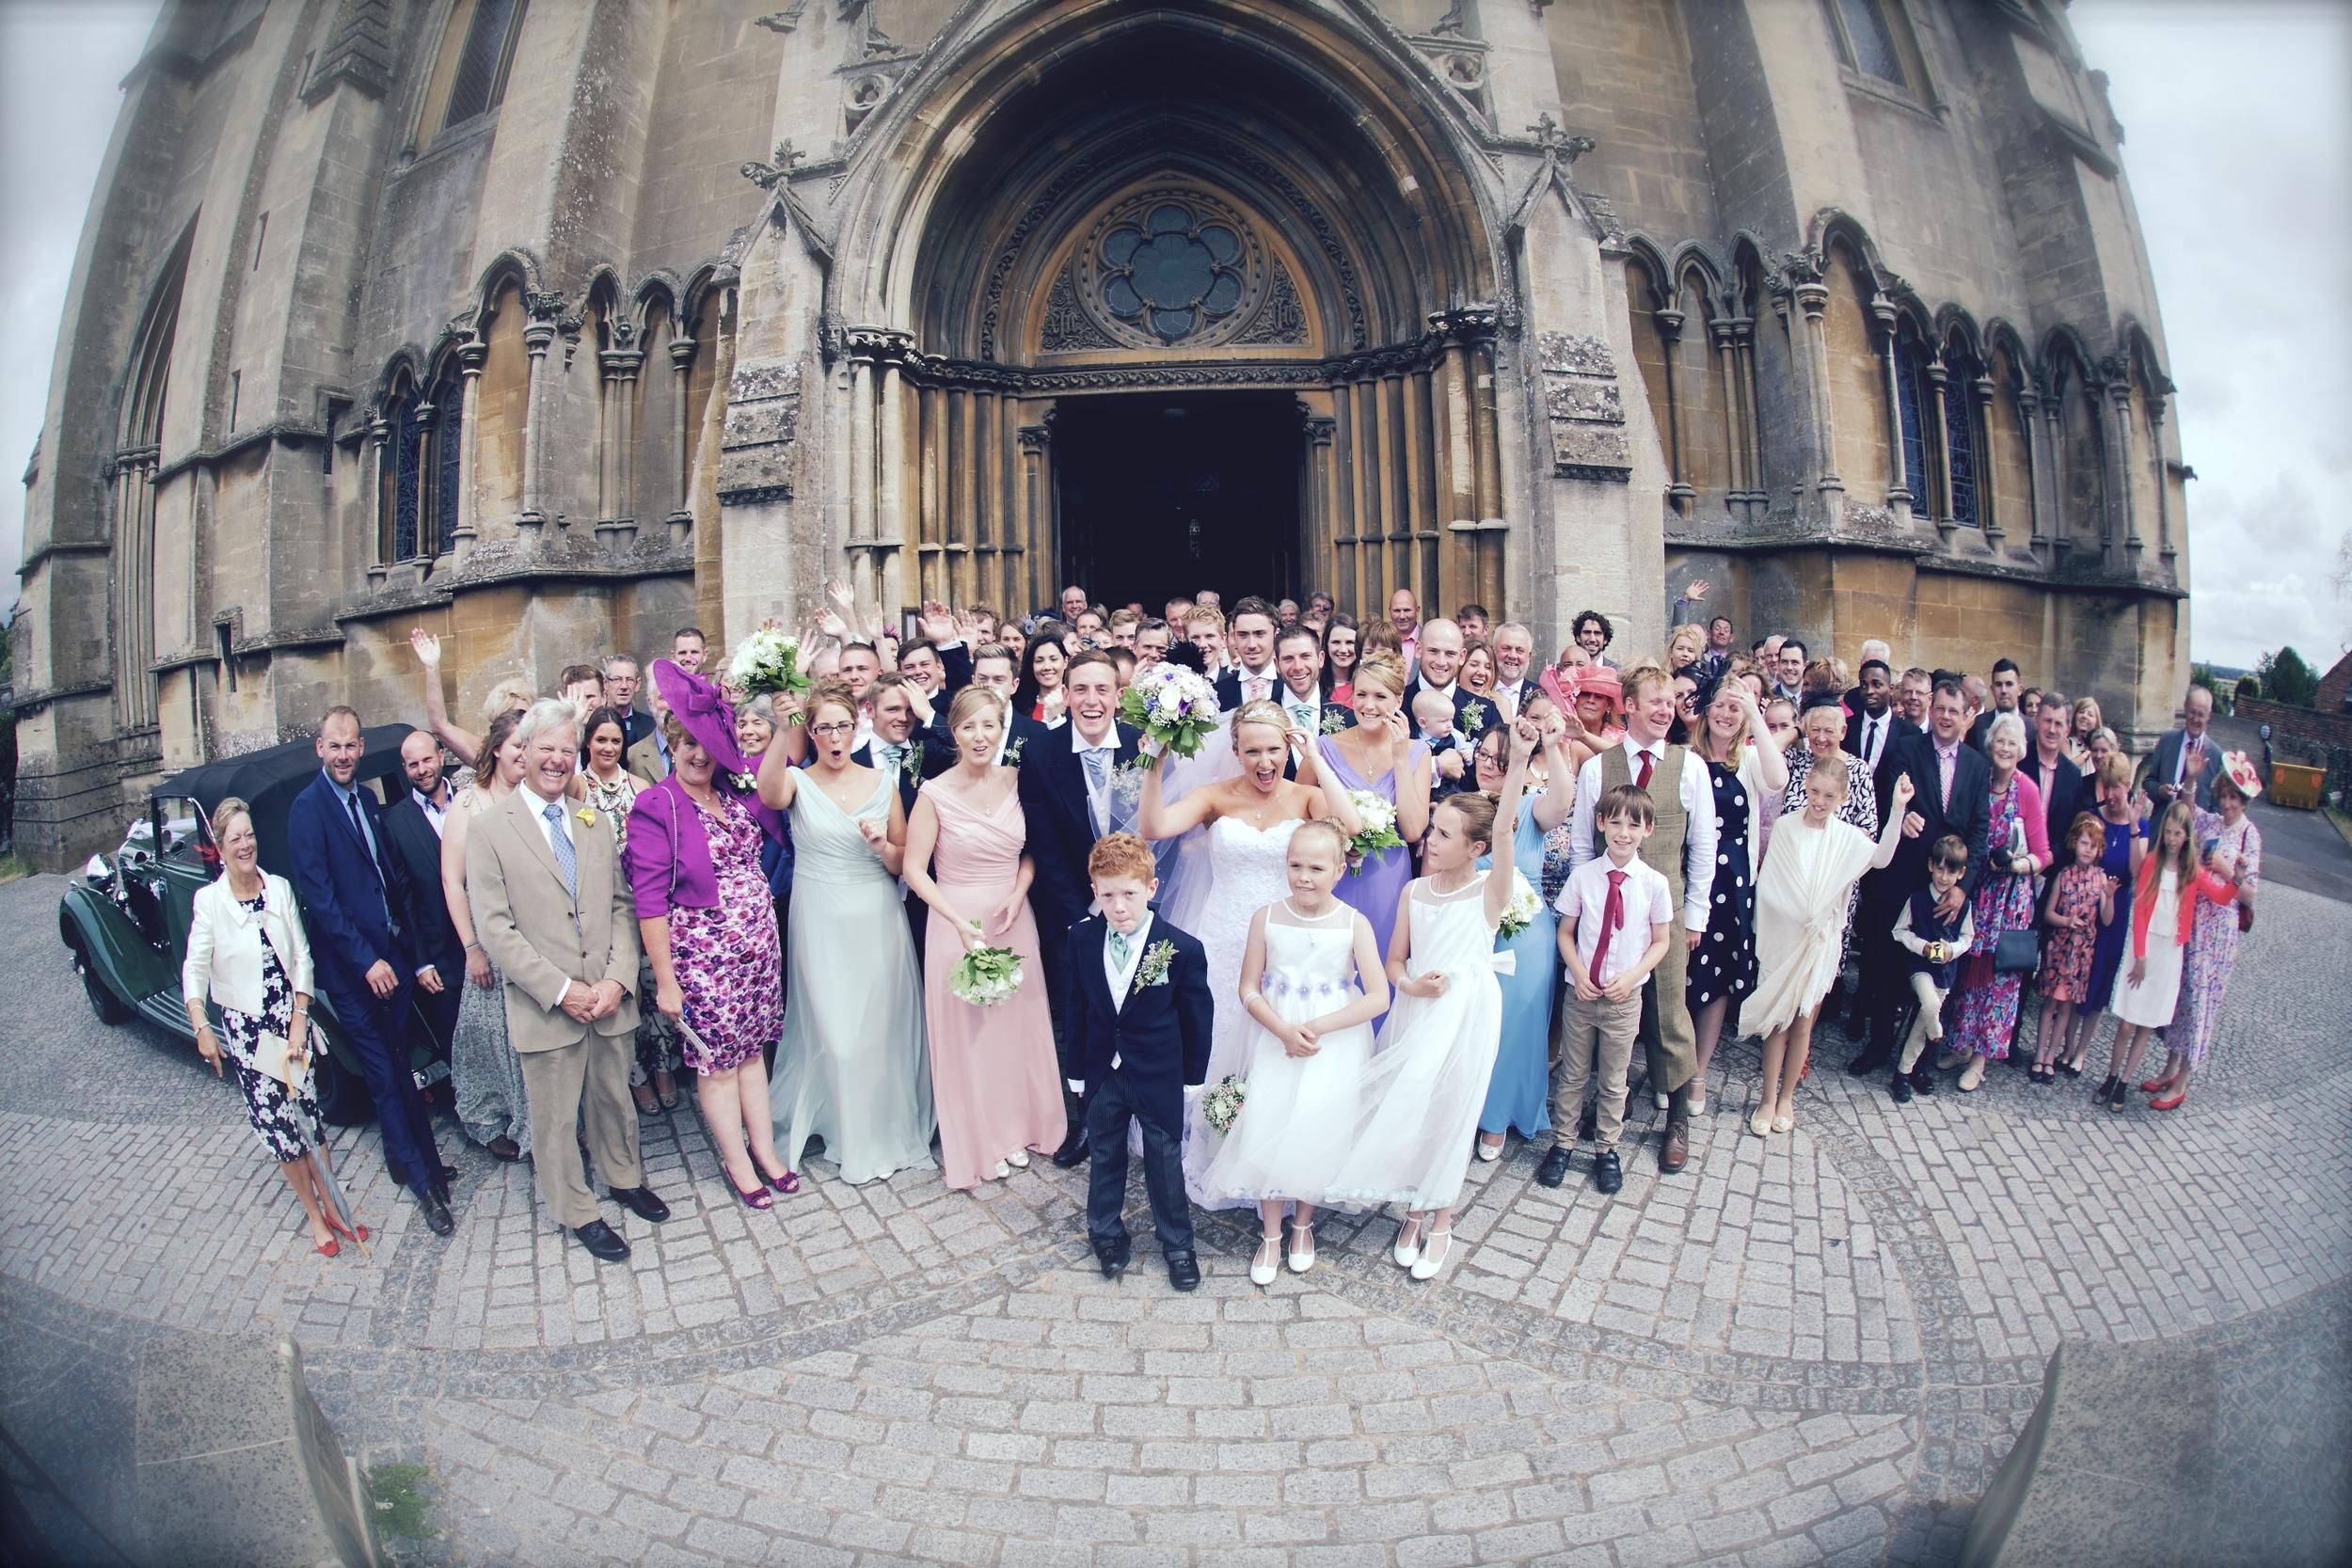 Weddings at Arundel cathedral